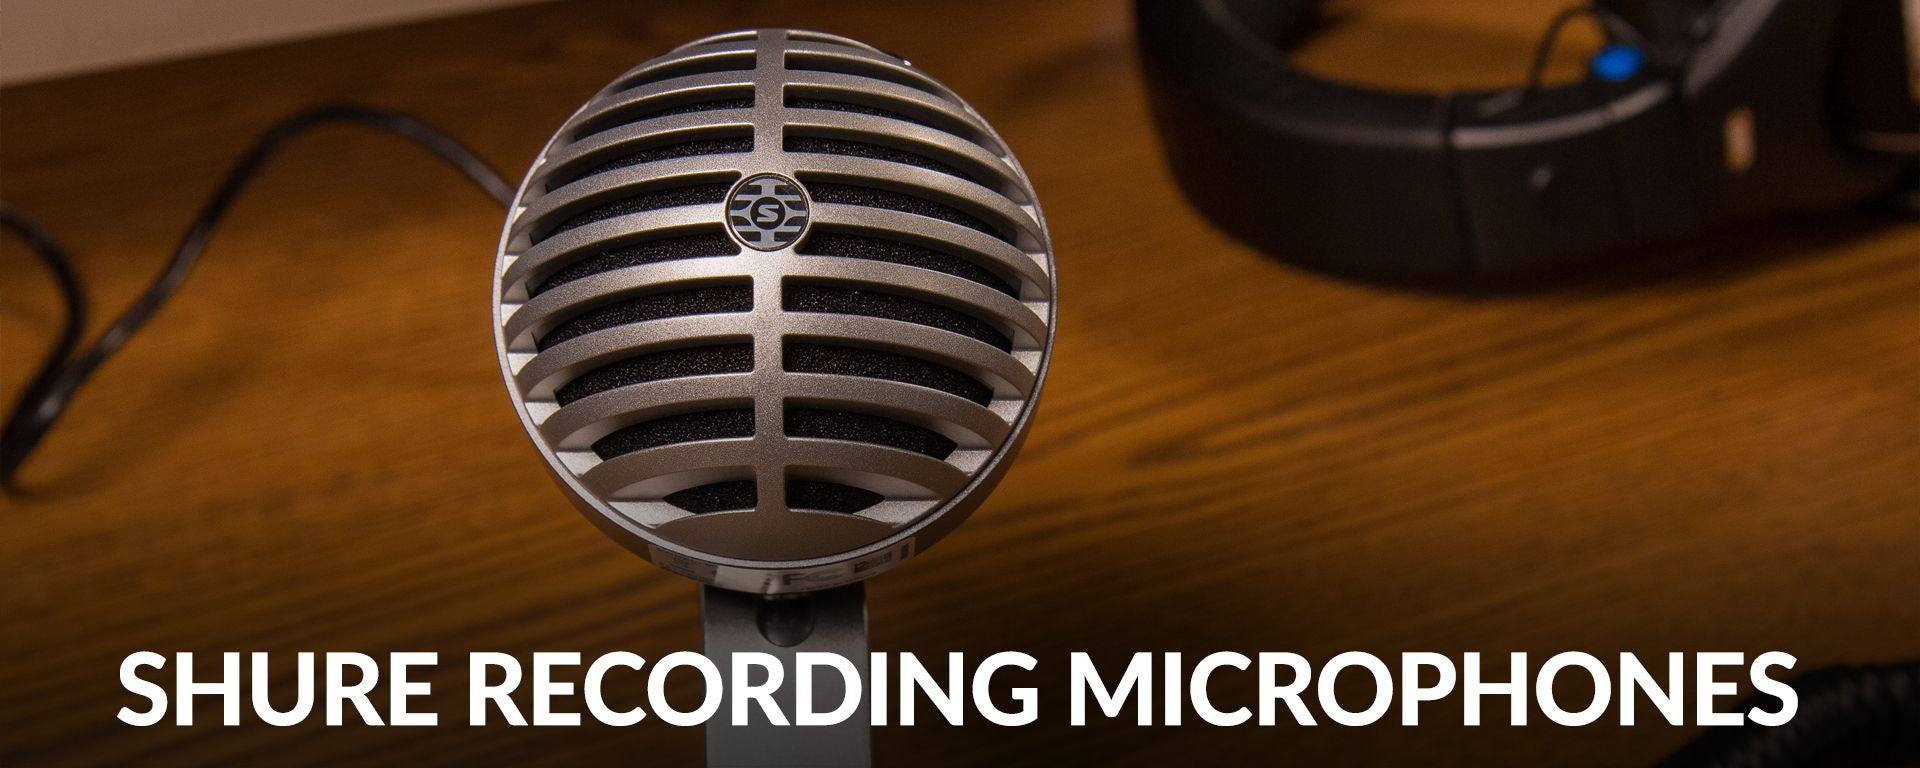 Shure Computer Microphones At Sam Ash